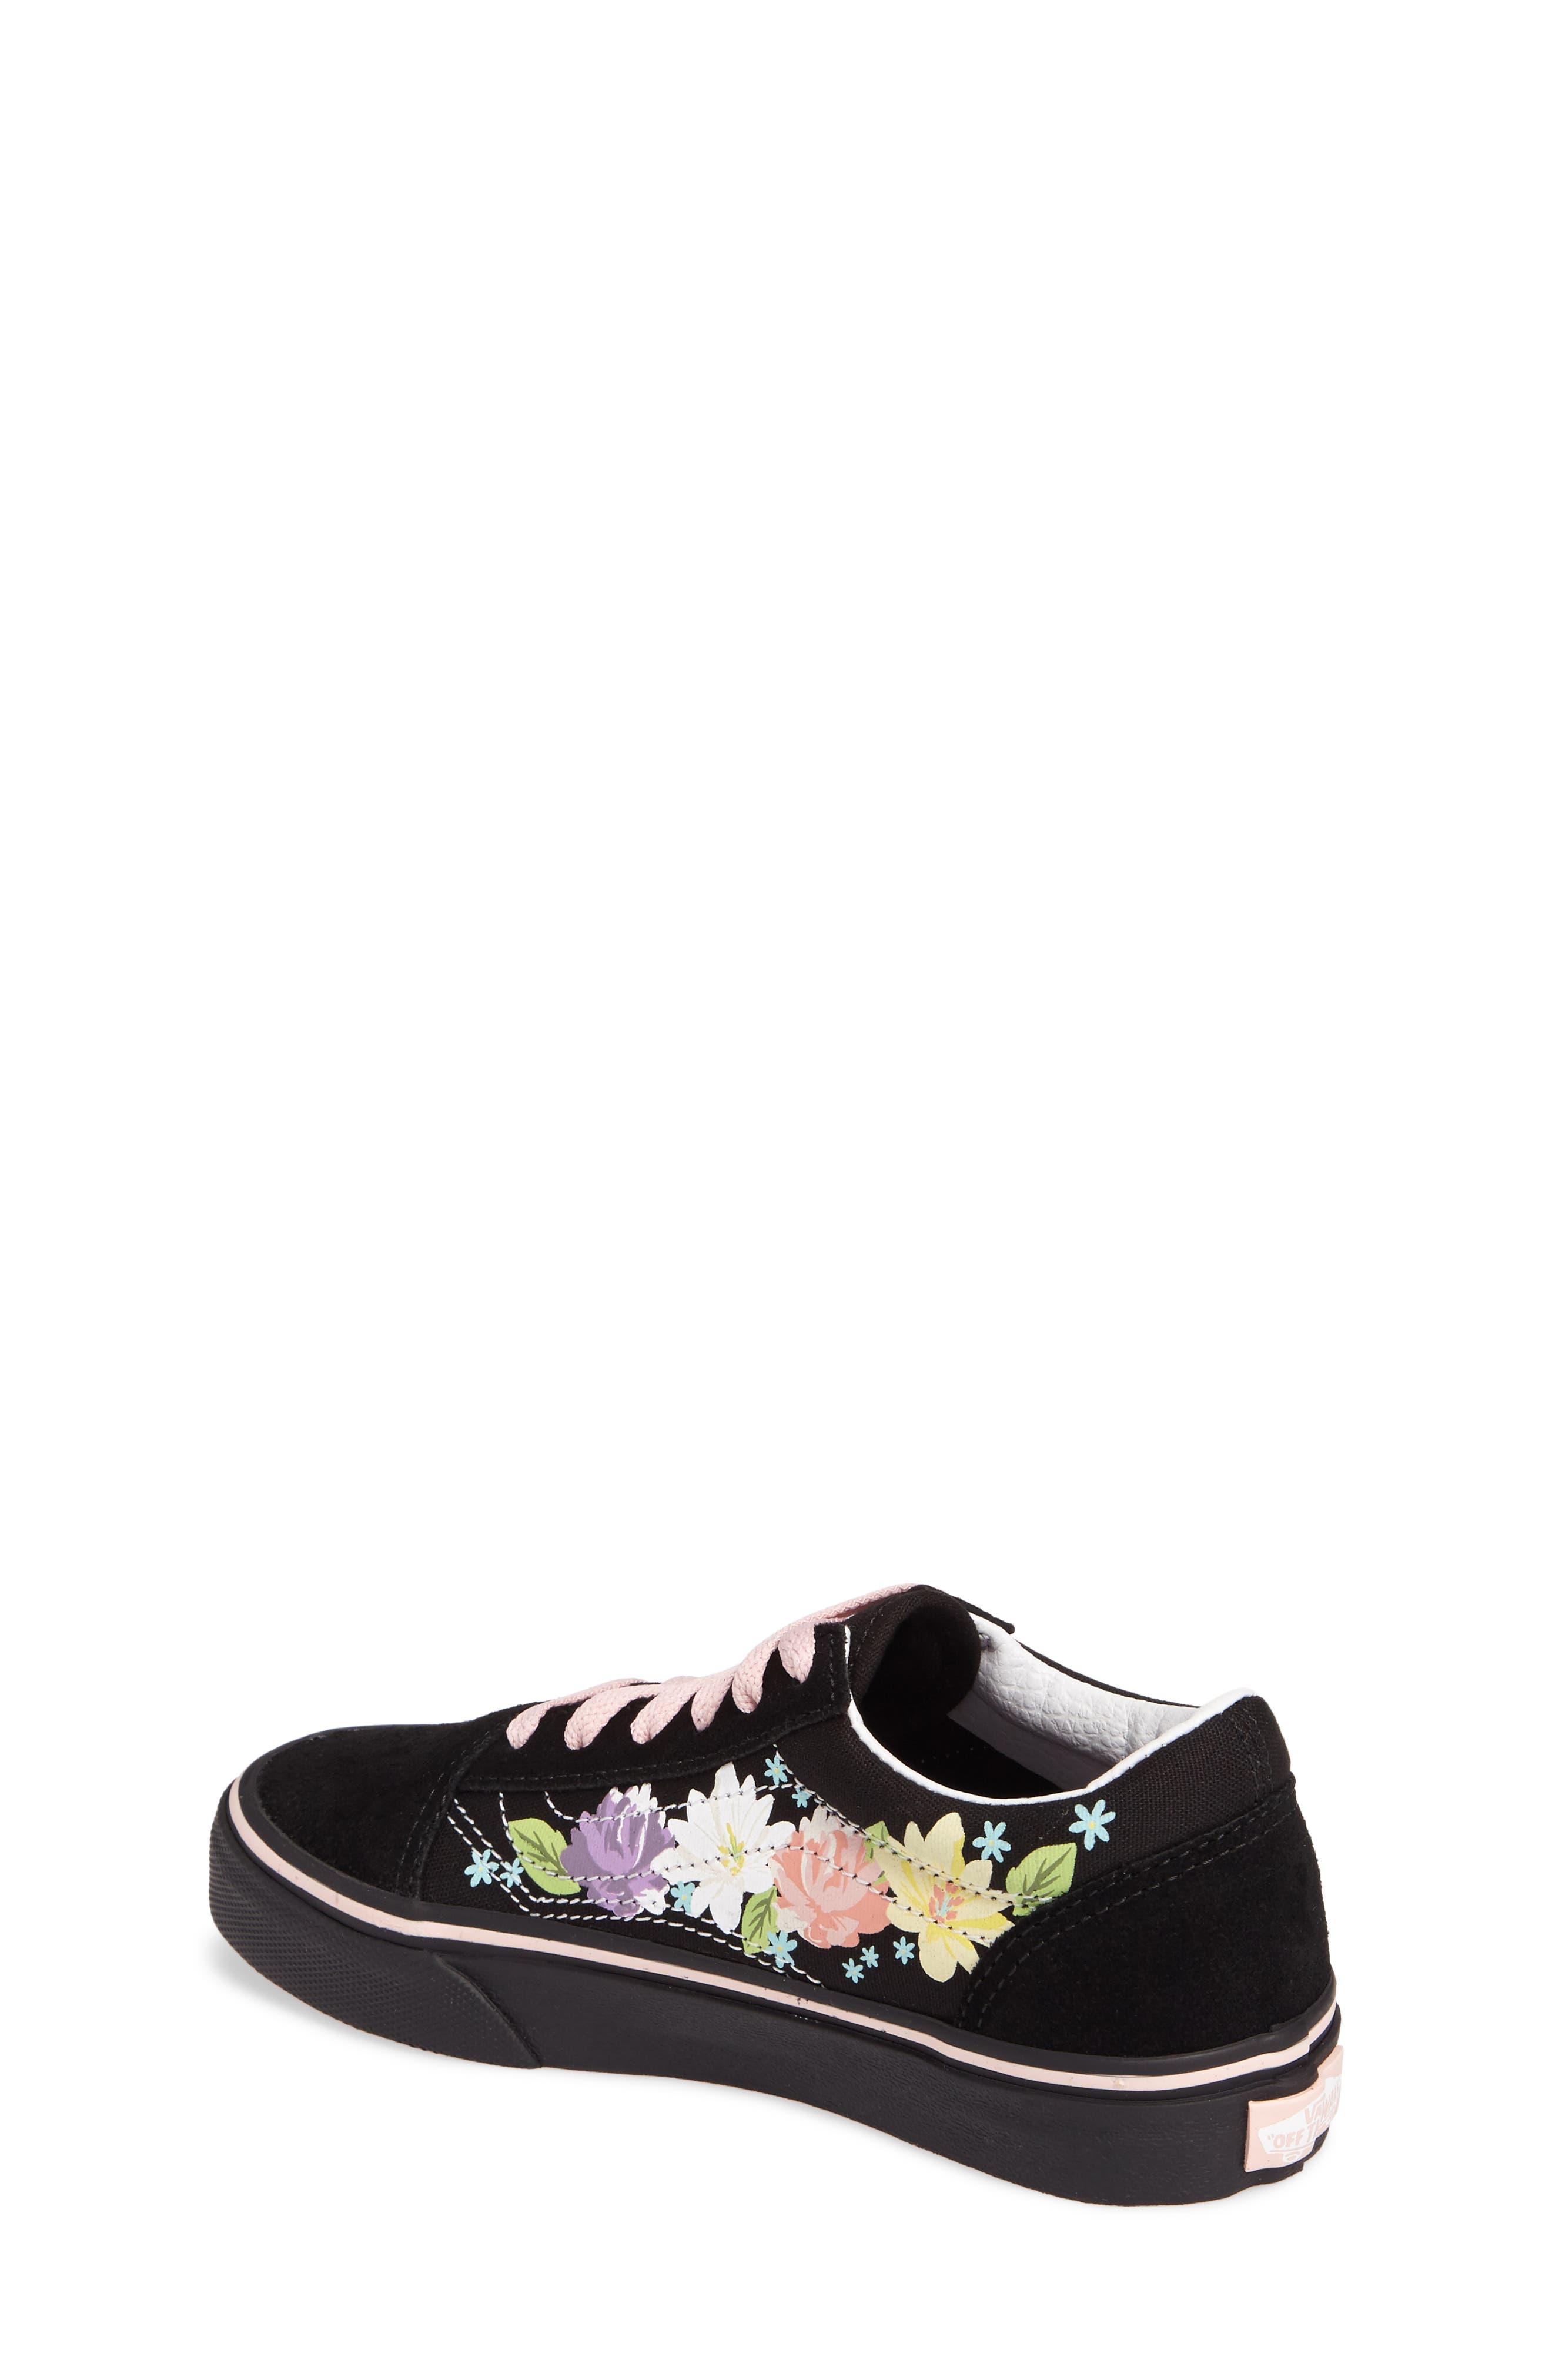 Old Skool Sneaker,                             Alternate thumbnail 2, color,                             001